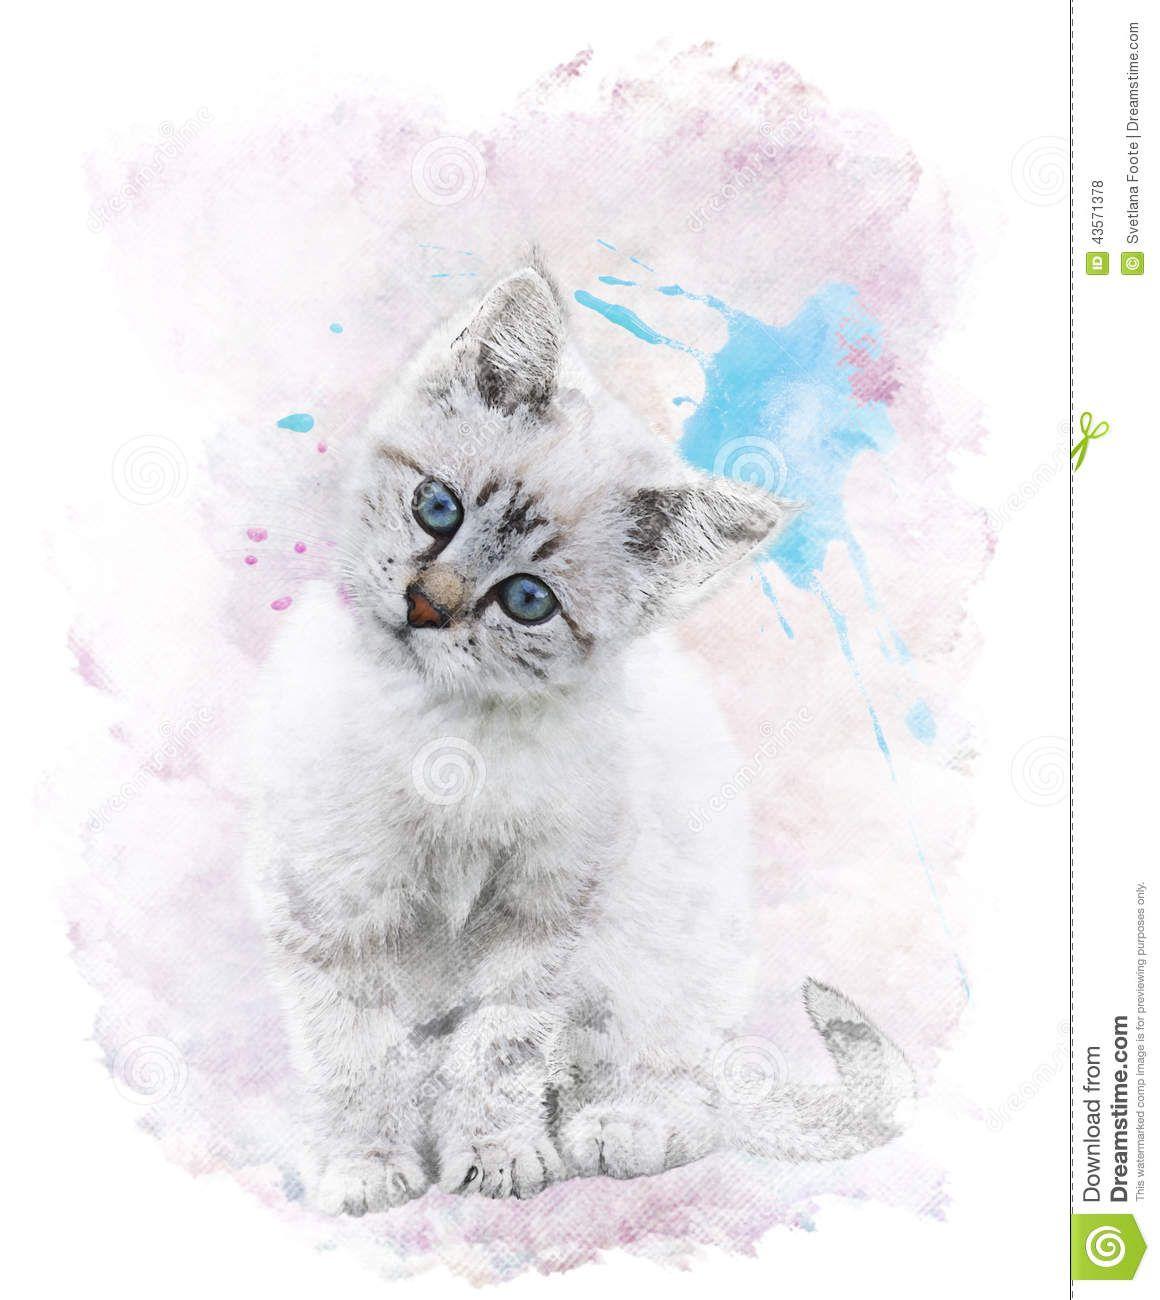 Watercolor Image Of White Kitten Watercolor Images White Kittens Stock Illustration